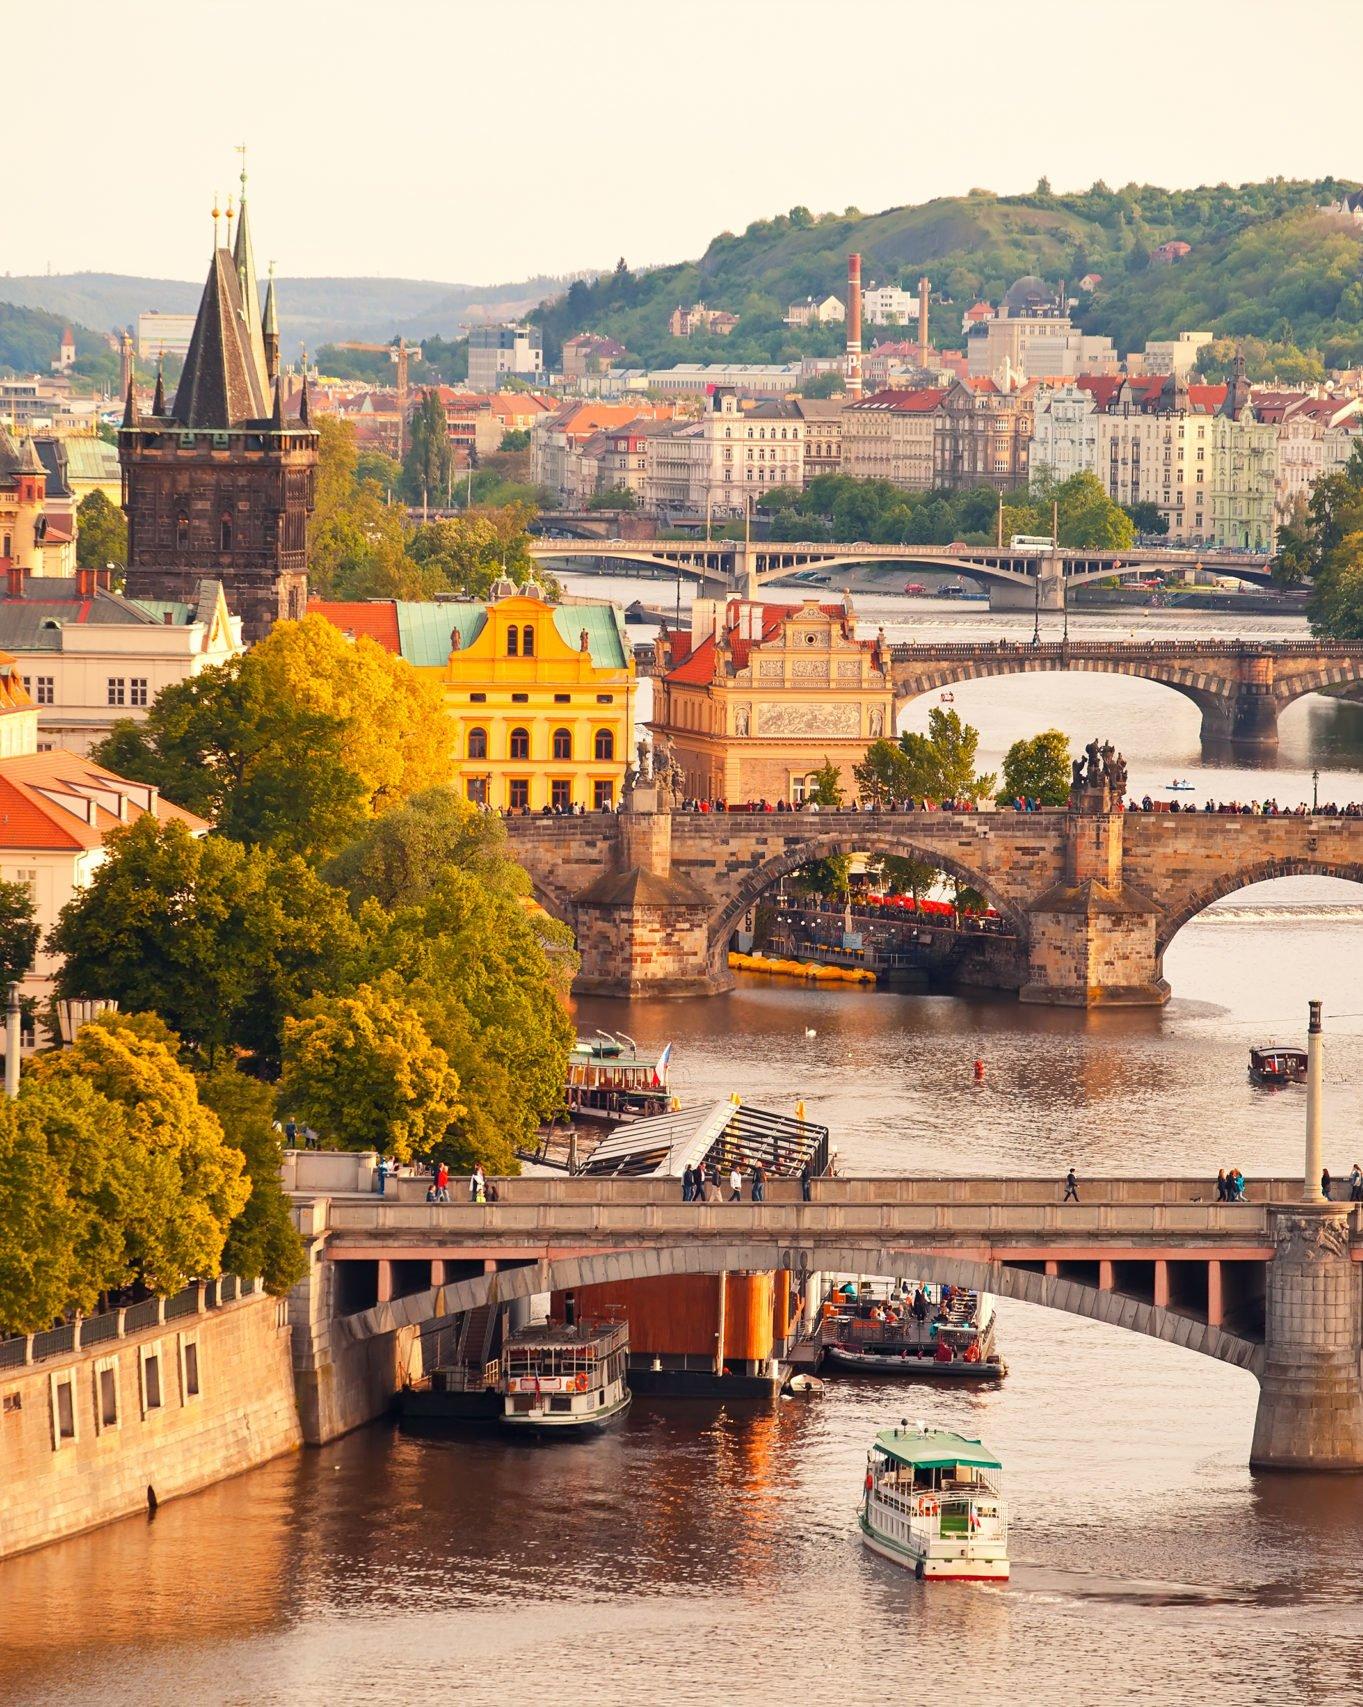 rivers and bridges in prague czech republic